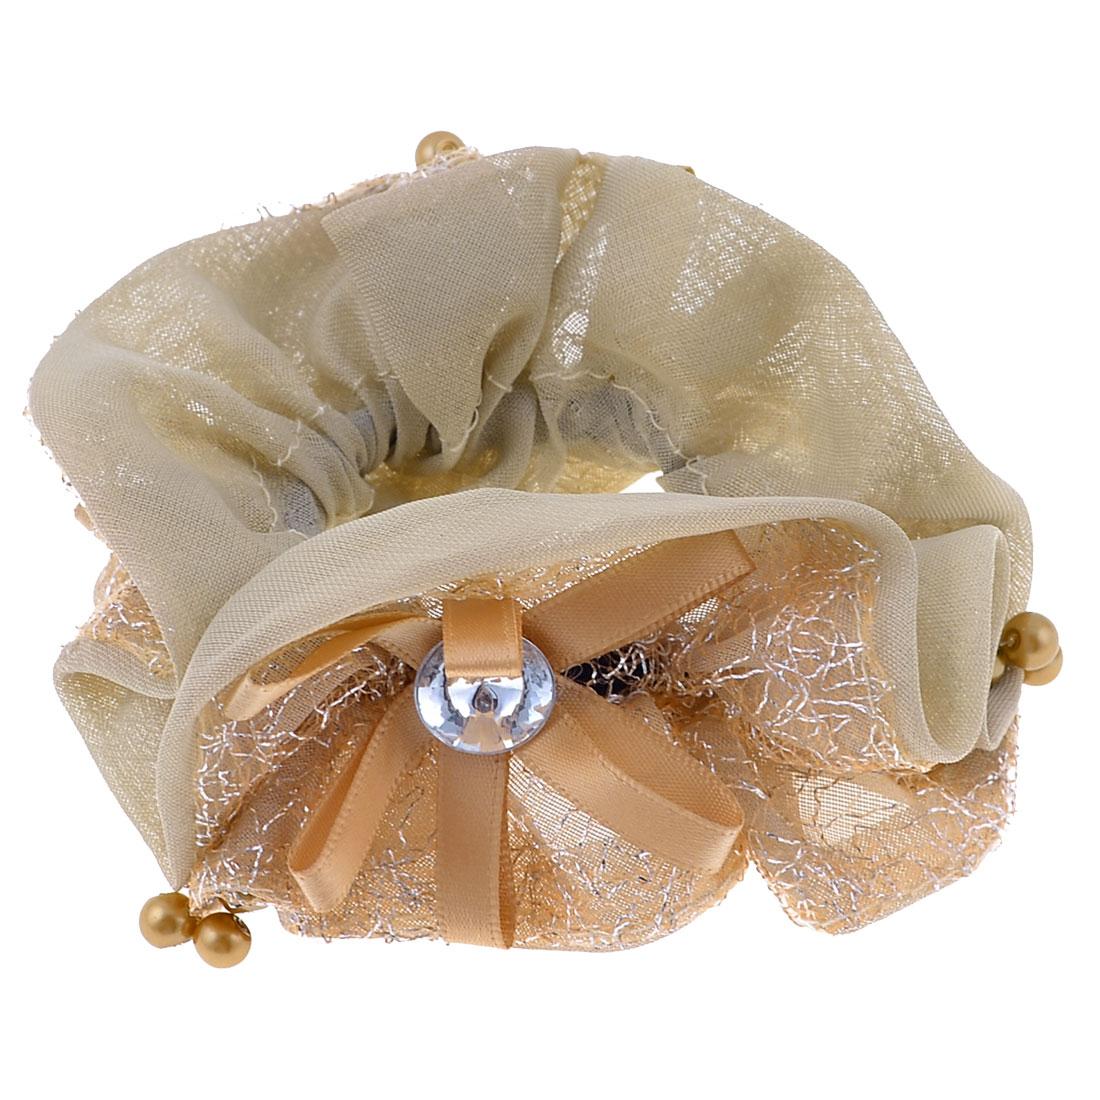 Plastic Beads Stretchy Ponytail Holder Hair Tie Band Khaki for Lady Girl